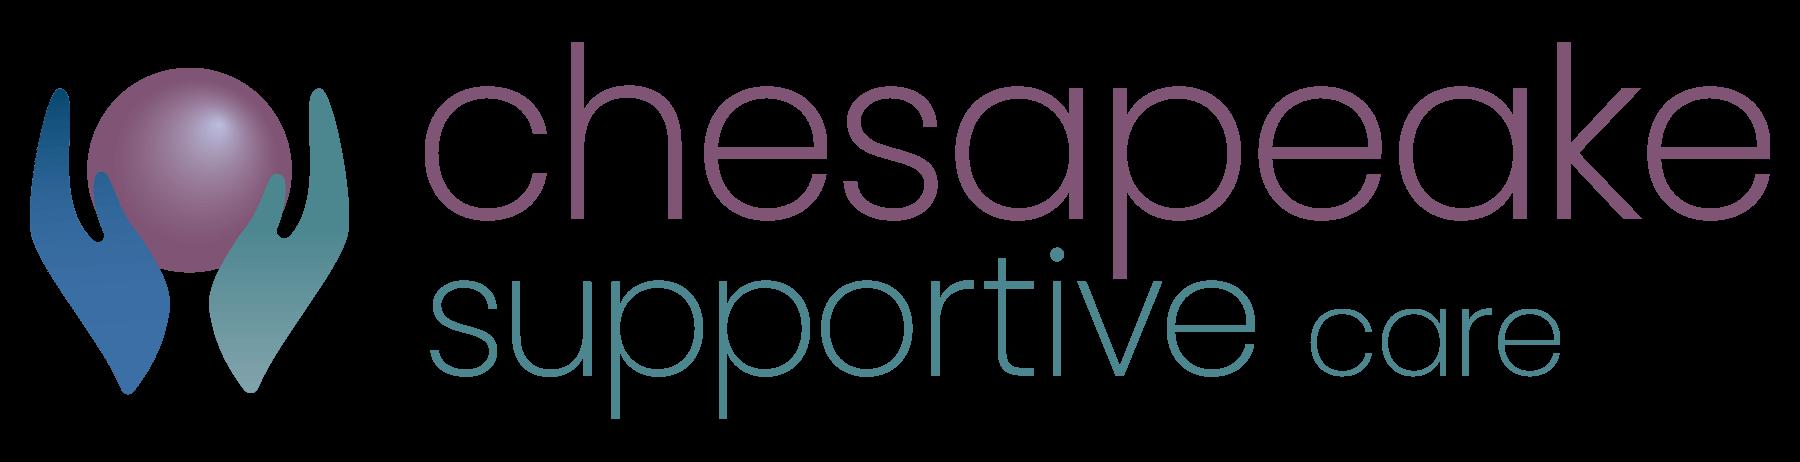 Chesapeake Supportive Care